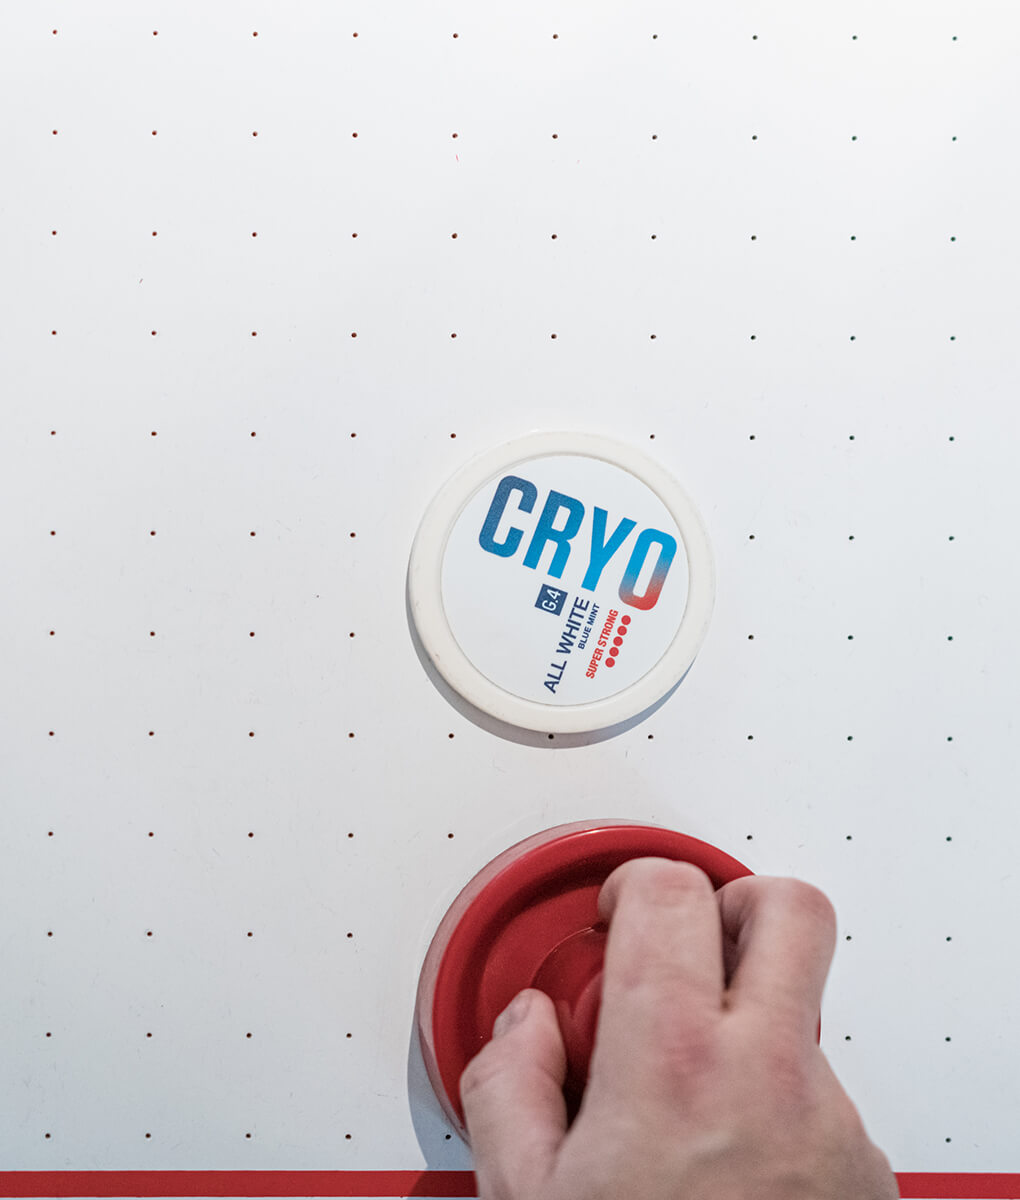 Cyro-Swedish-Match-soerenfunk-6179_web